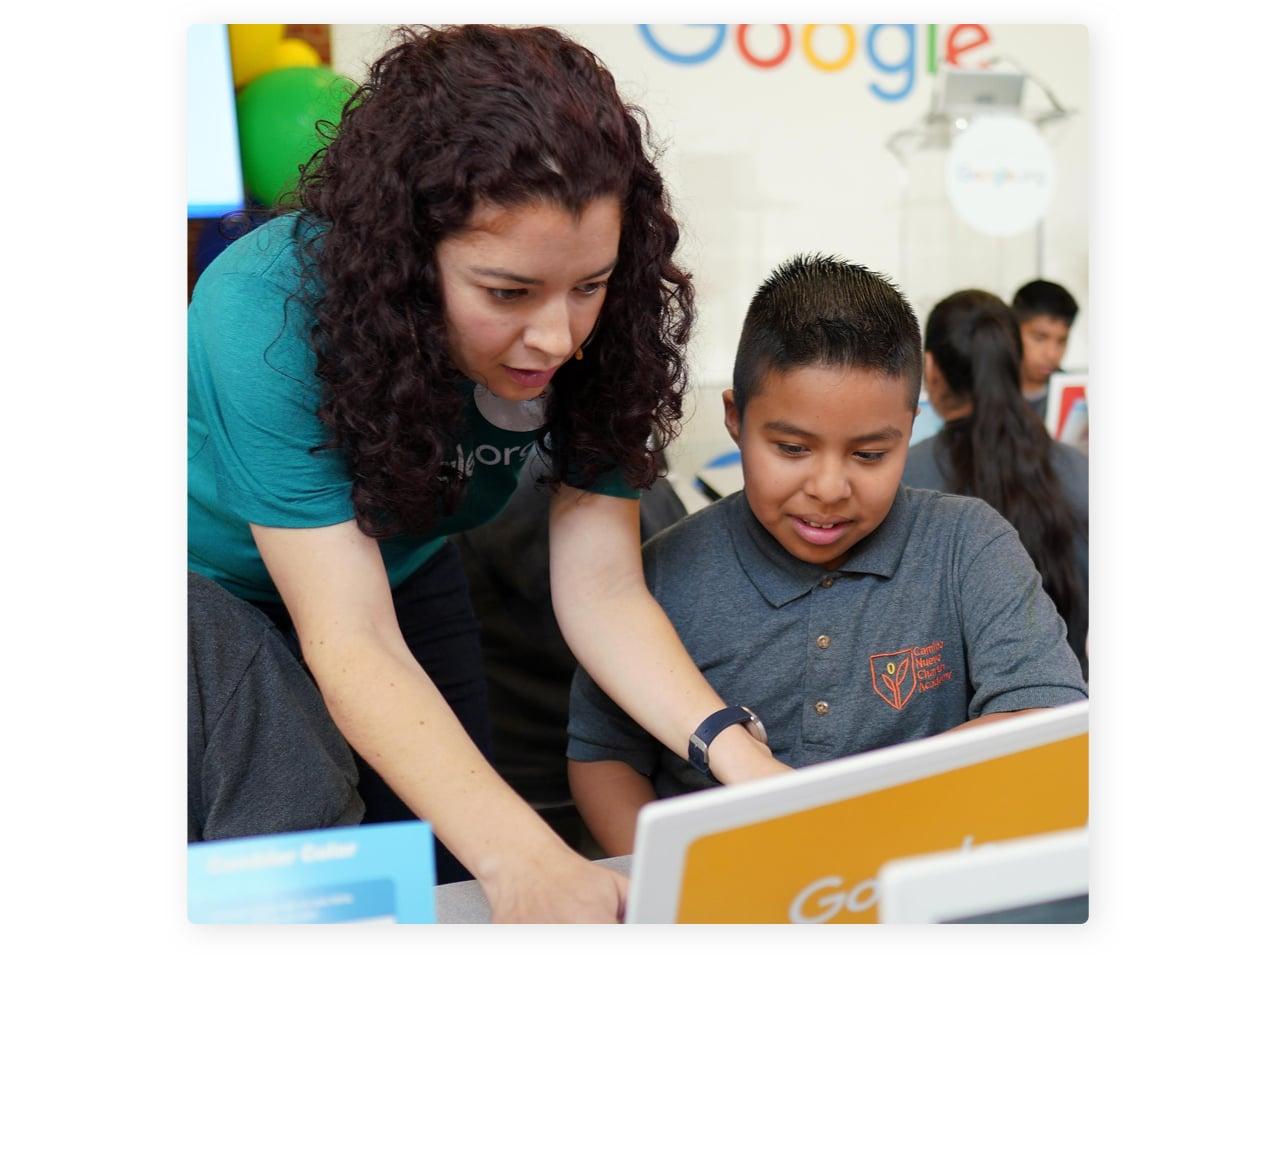 Google employee working in their community